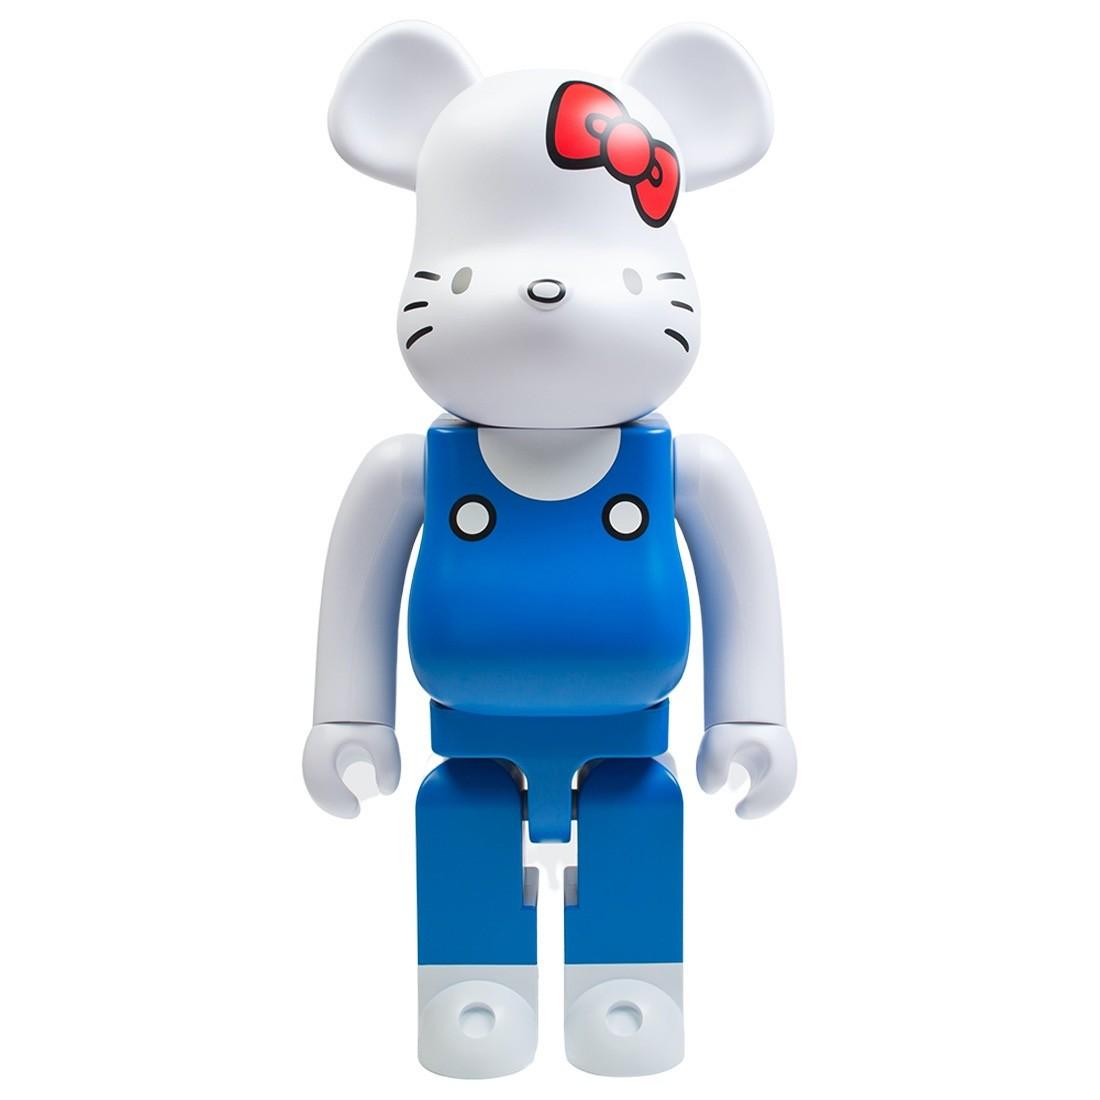 Medicom Hello Kitty Generation 70s 1000% Bearbrick Figure (blue)